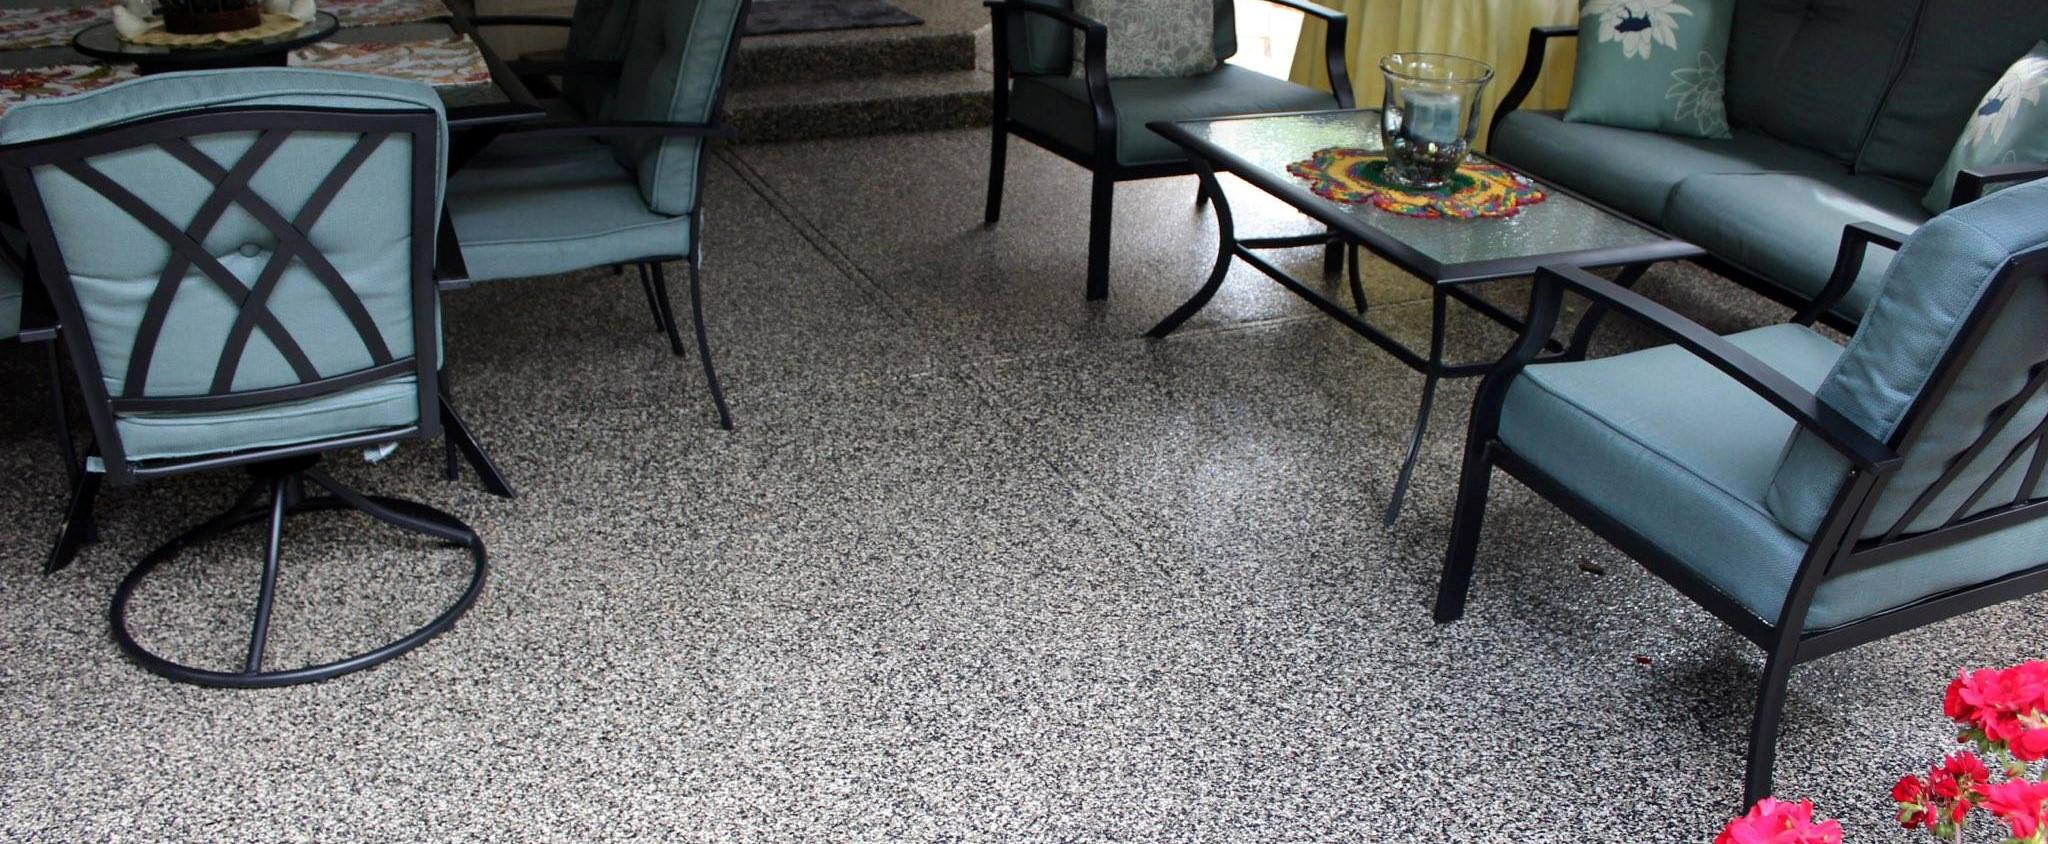 American Concrete Coatings reviews   Masonry/Concrete at 401 Crowley Rd - Arlington TX